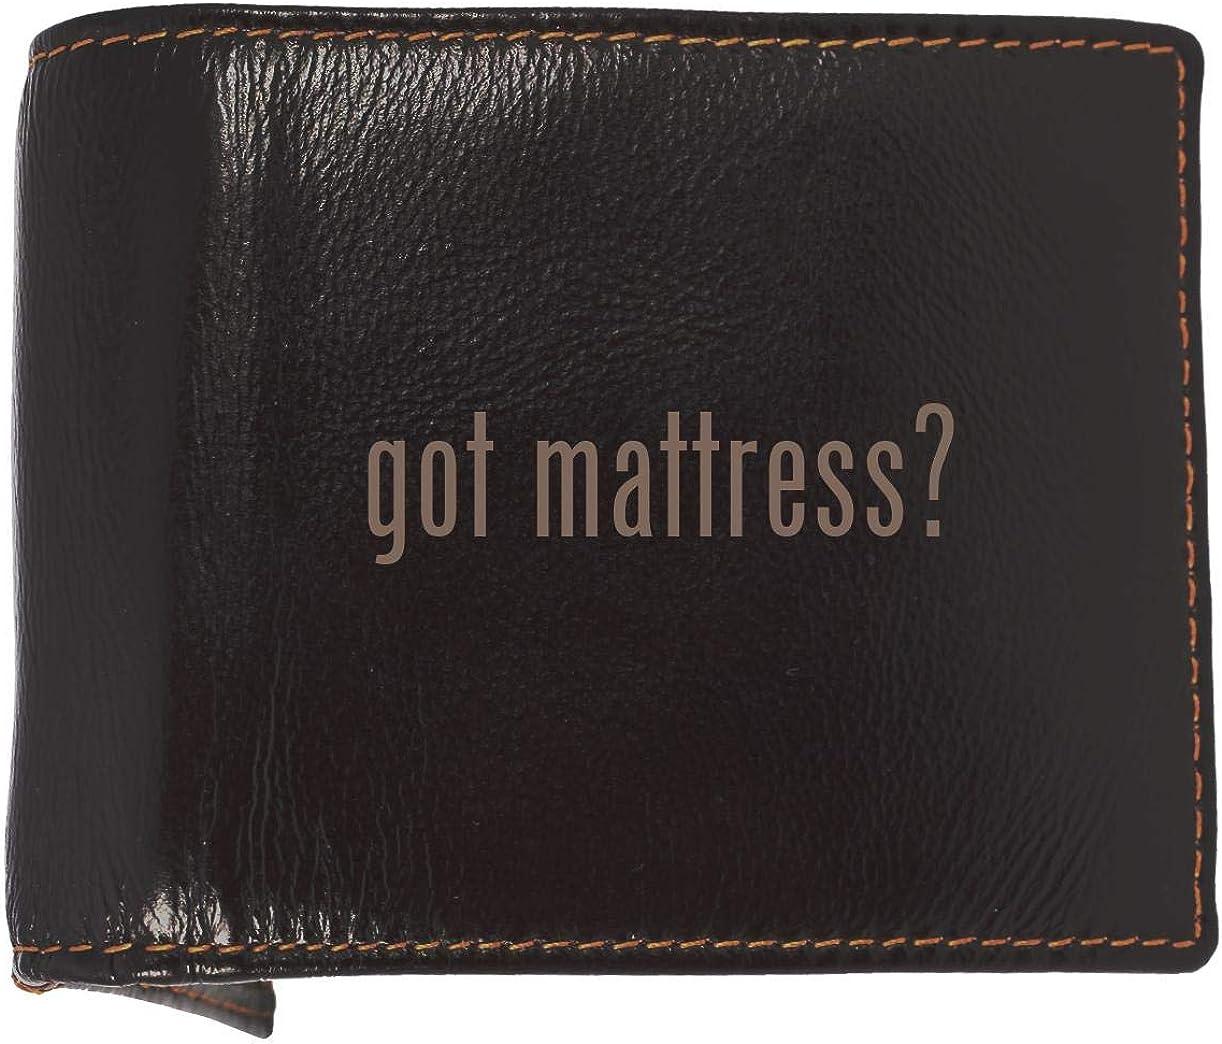 got mattress? - Soft Cowhide Genuine Engraved Bifold Leather Wallet